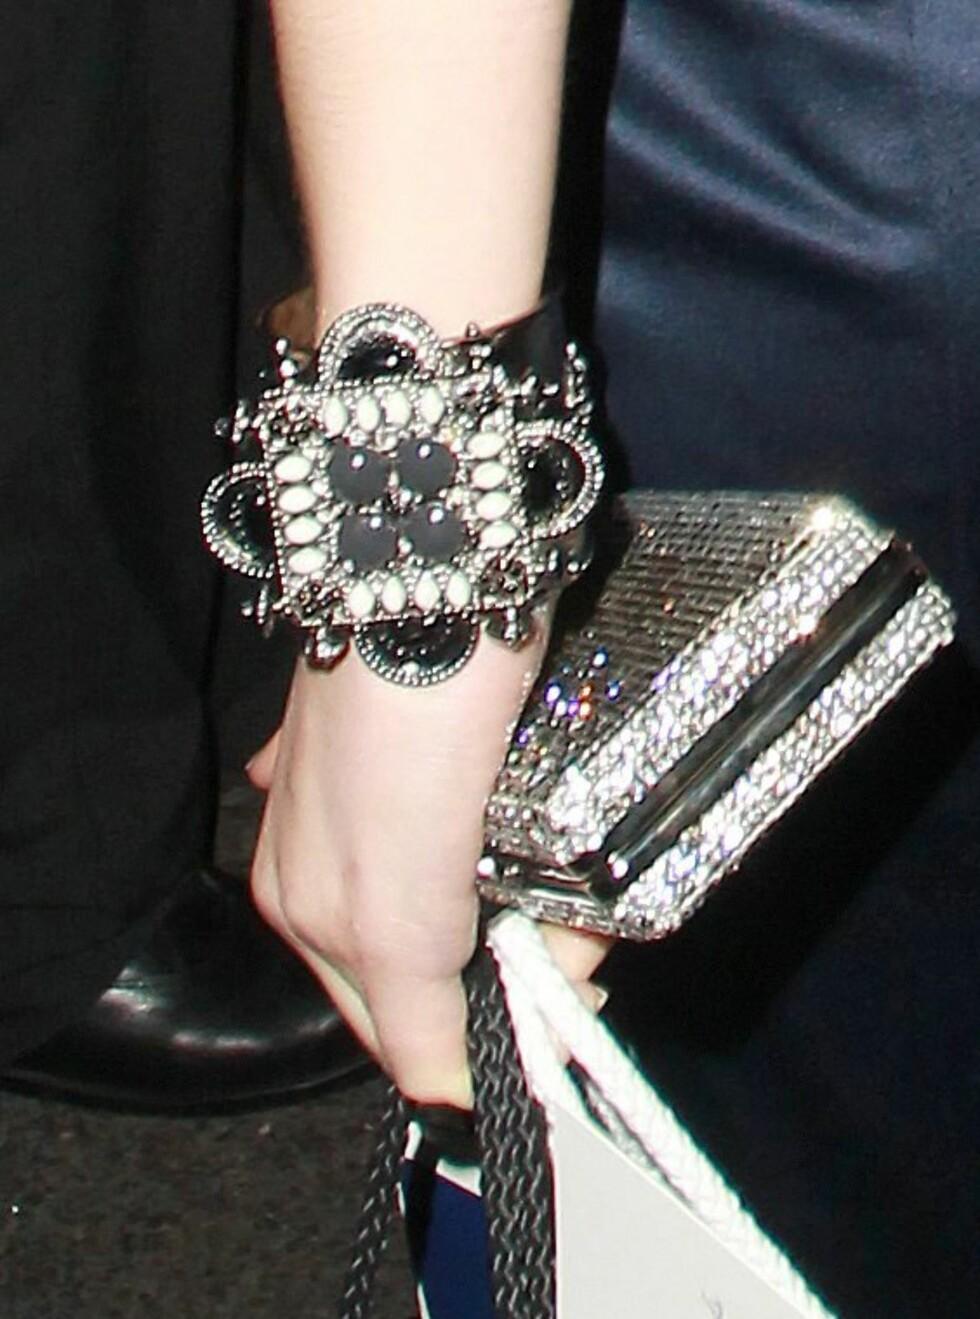 Skuespiller Emma Watson på BAFTA-fest i glitrende rocka armbånd.  Foto: All Over Press